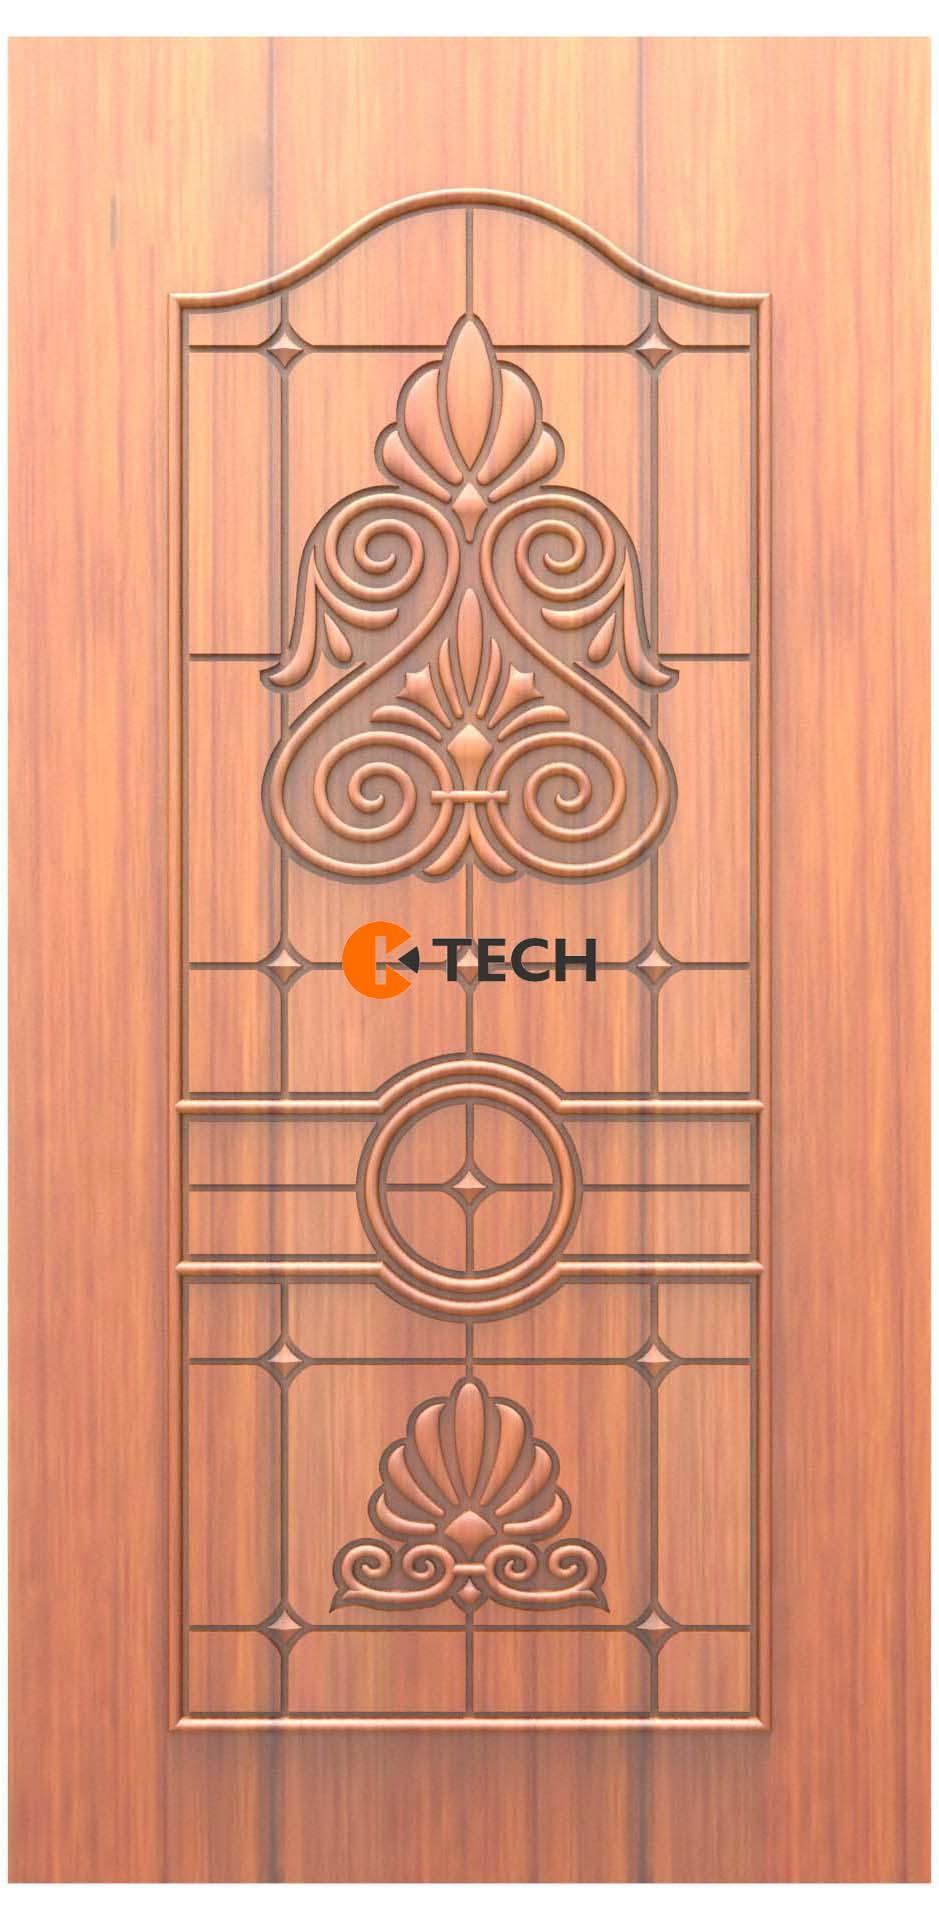 K-TECH CNC Doors Design 178